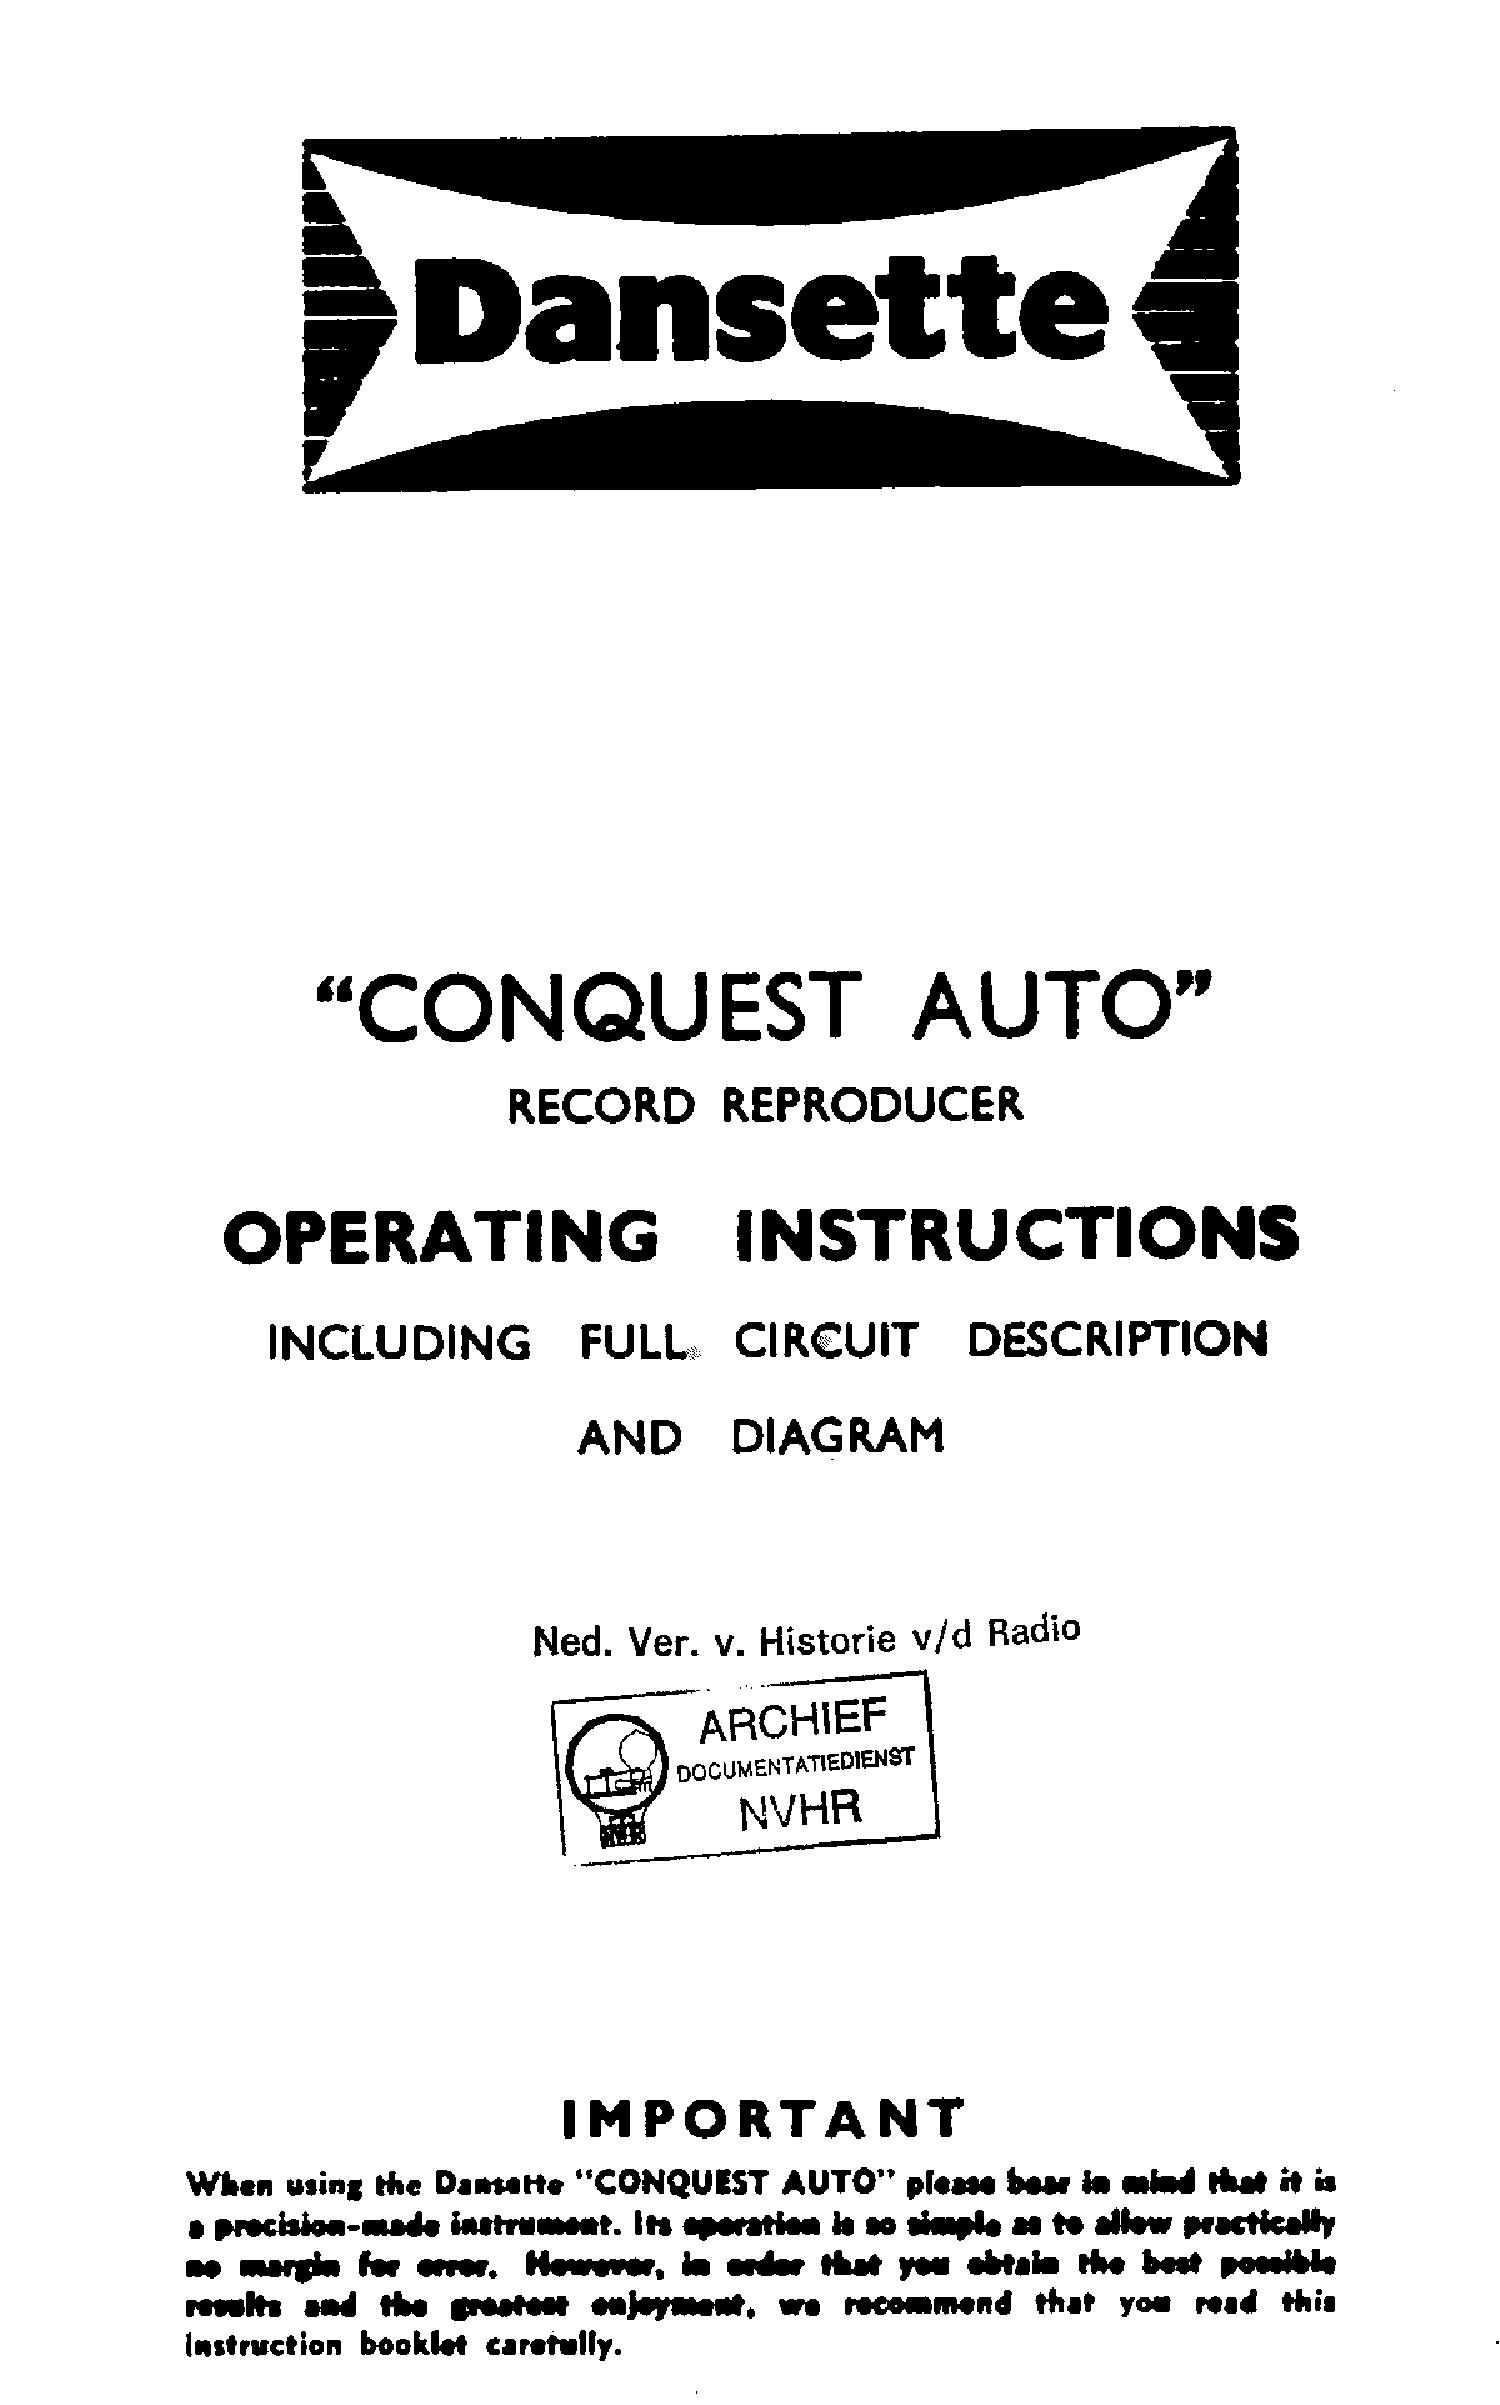 dansette conquest auto record reproducer sch service manual download rh elektrotanya com 2000 argo conquest service manual 2000 argo conquest service manual